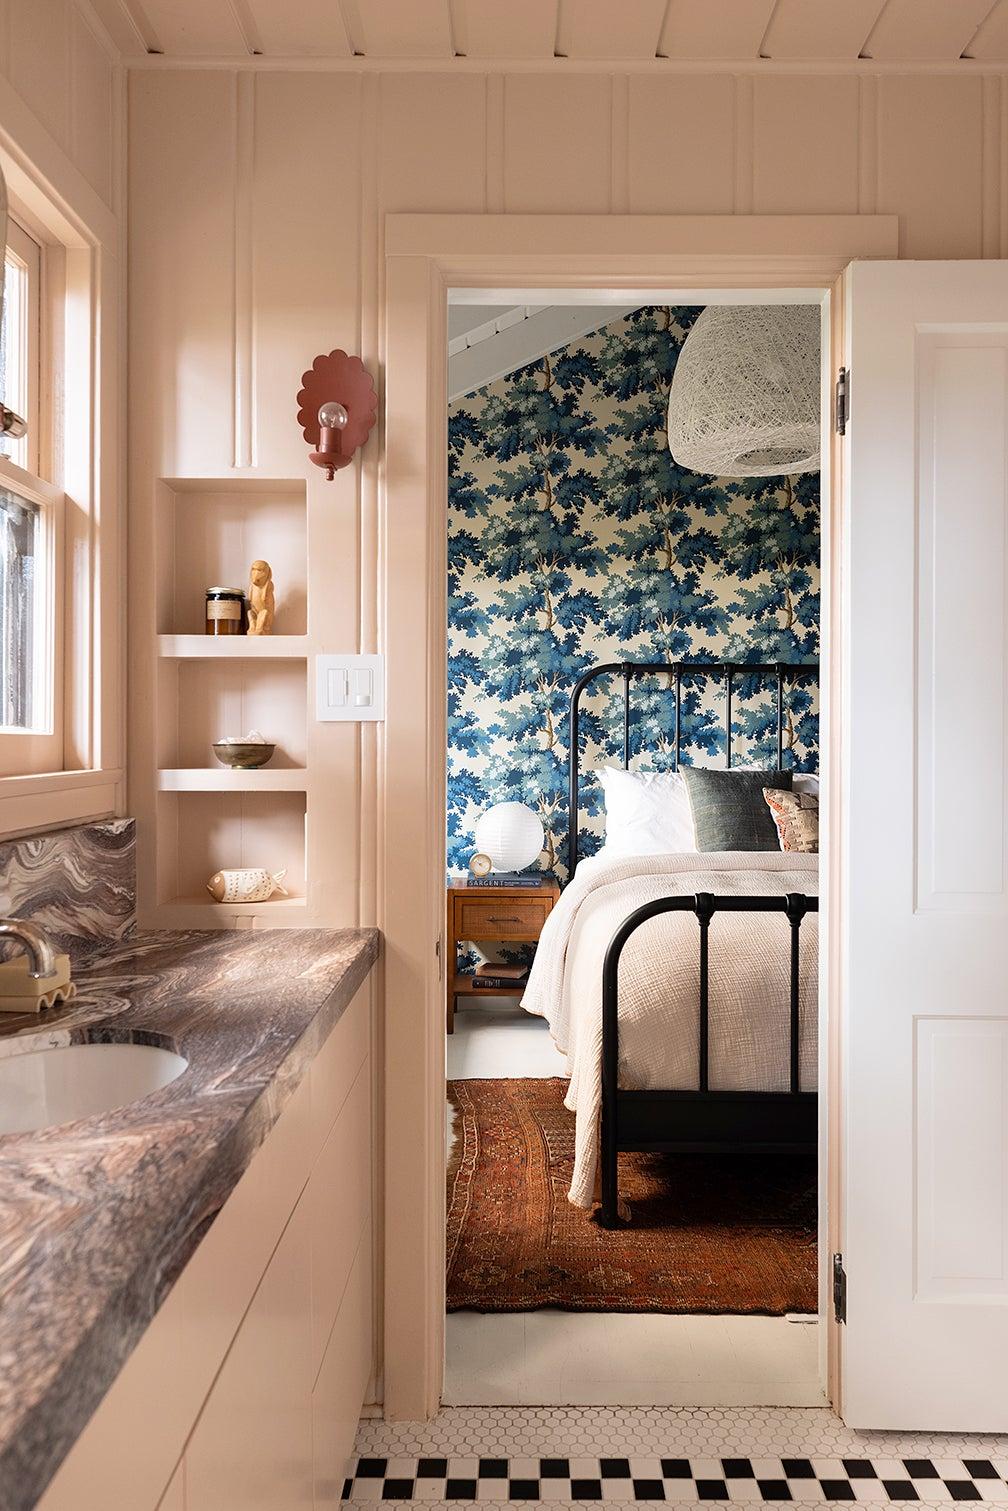 pink bathroom looking into blue bedroom